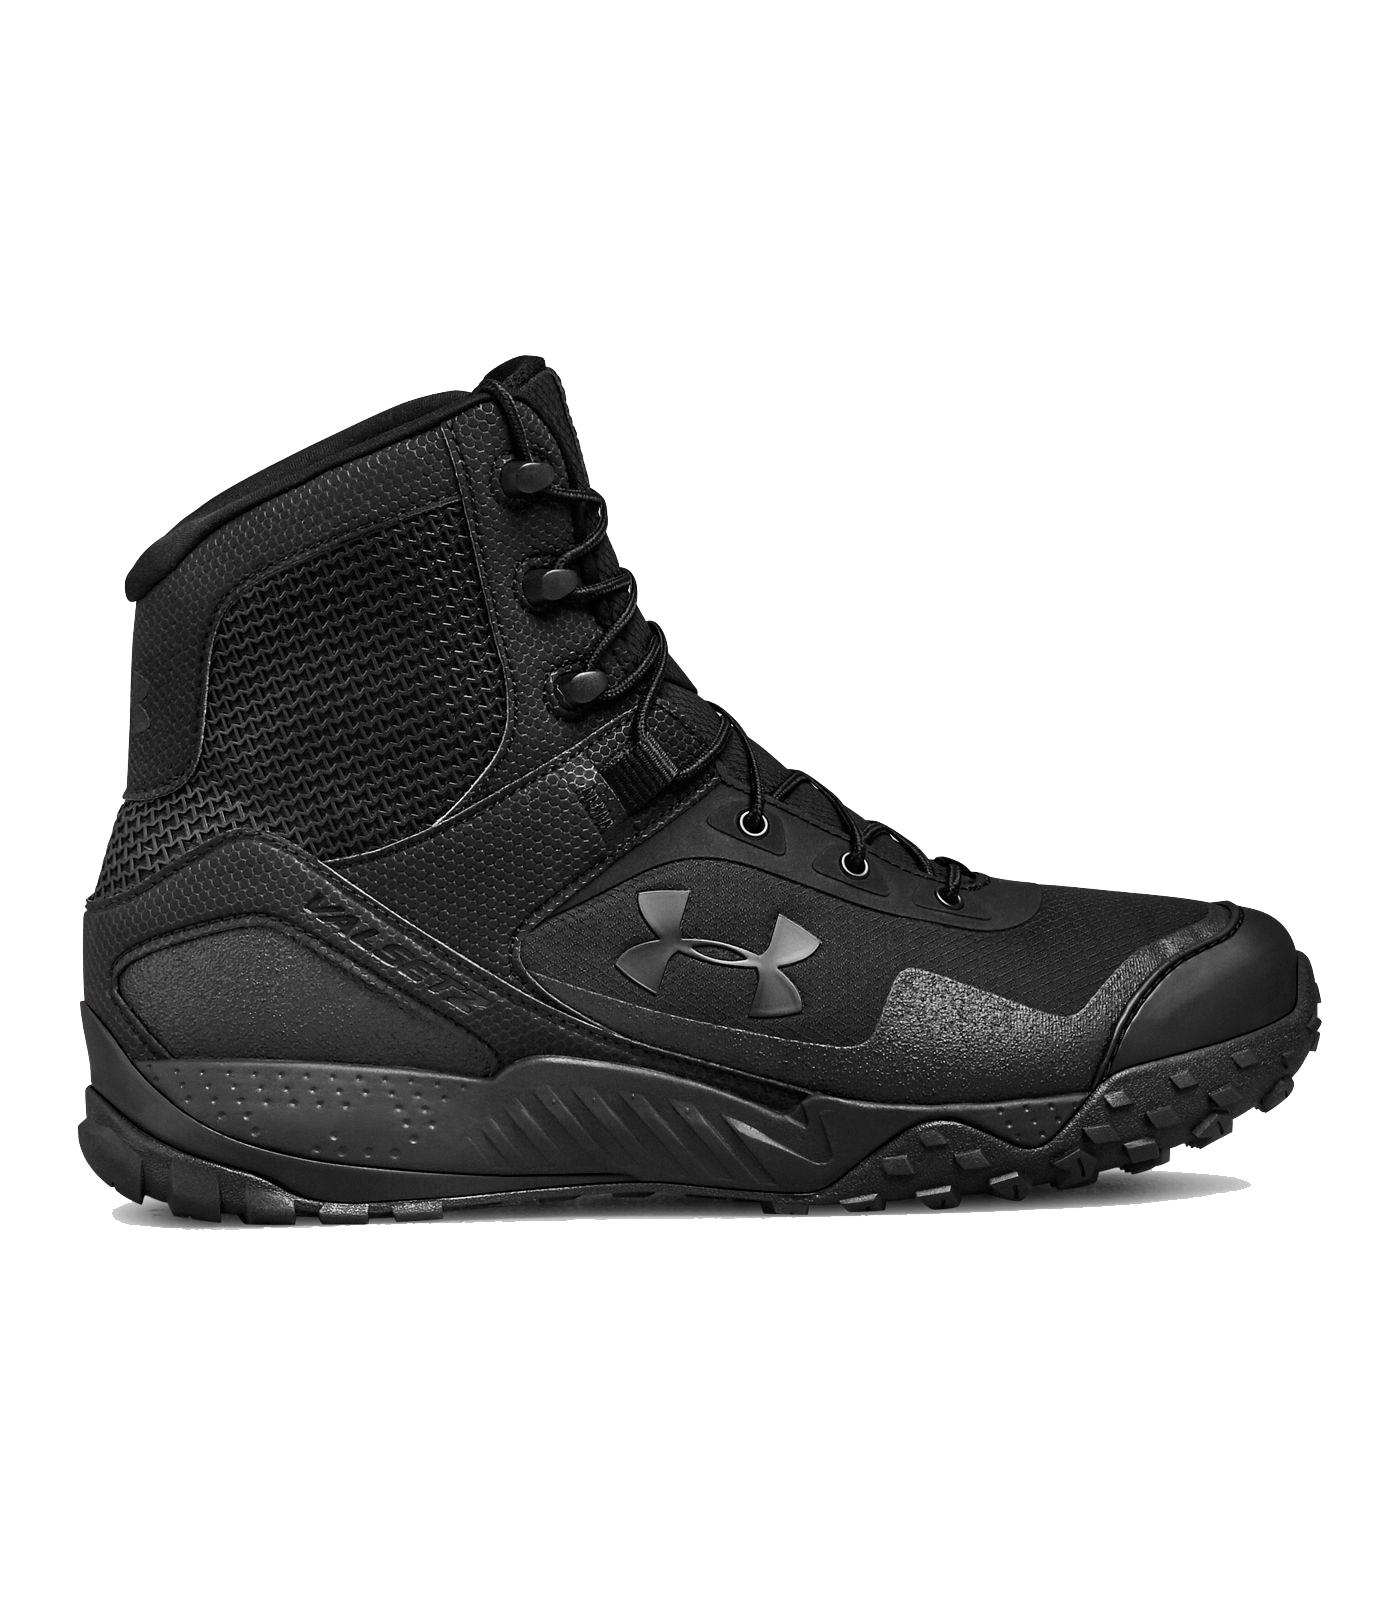 Under Armour Men S Ua Valsetz Rts 1 5 Tactical Boots Ebay